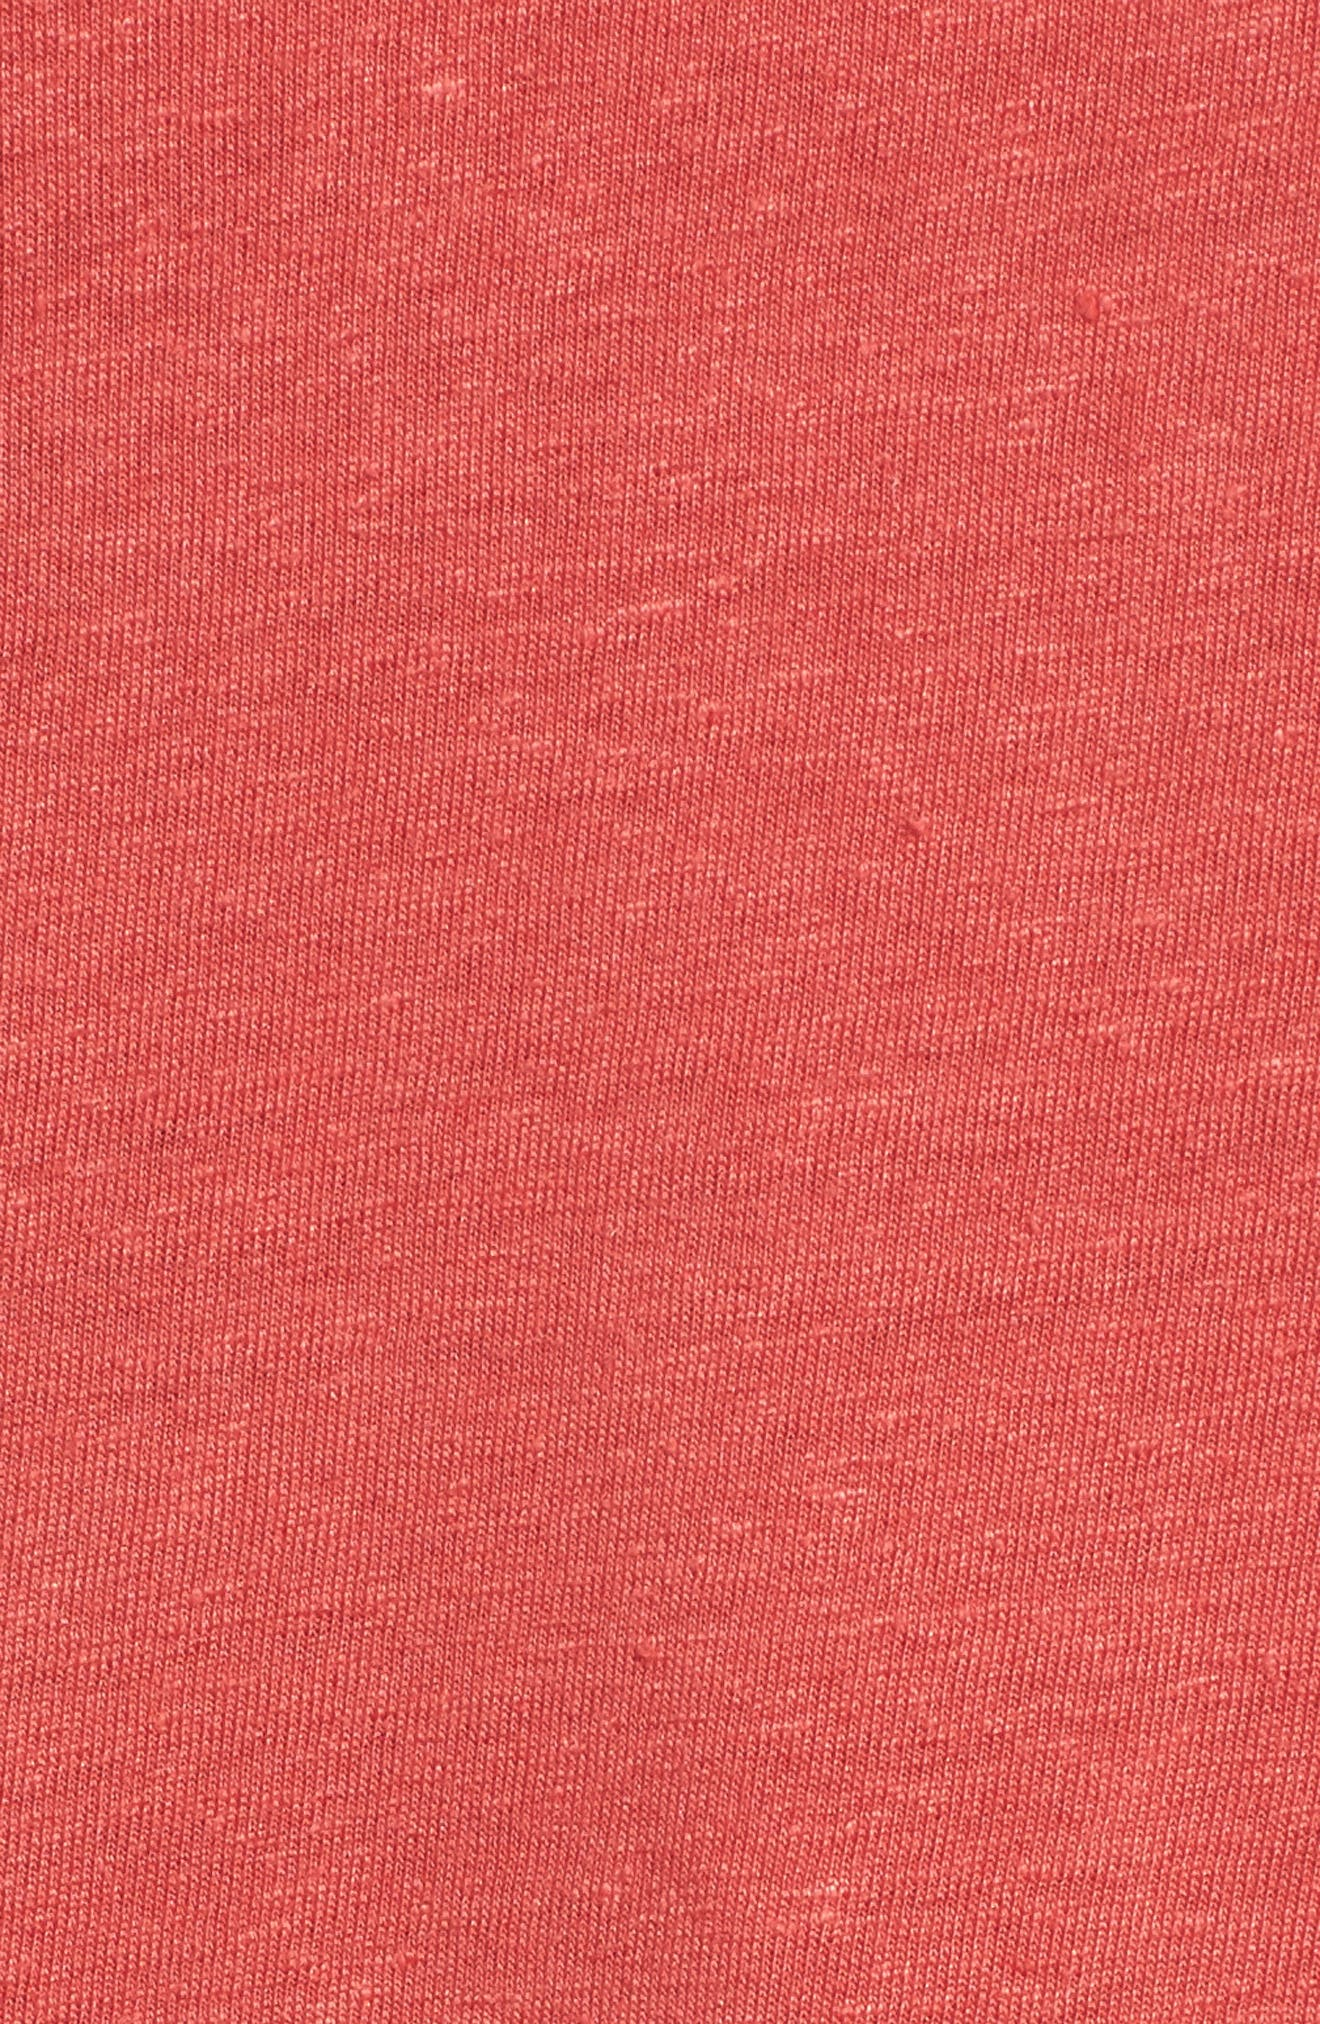 Ruffle Sleeve Tee,                             Alternate thumbnail 5, color,                             610